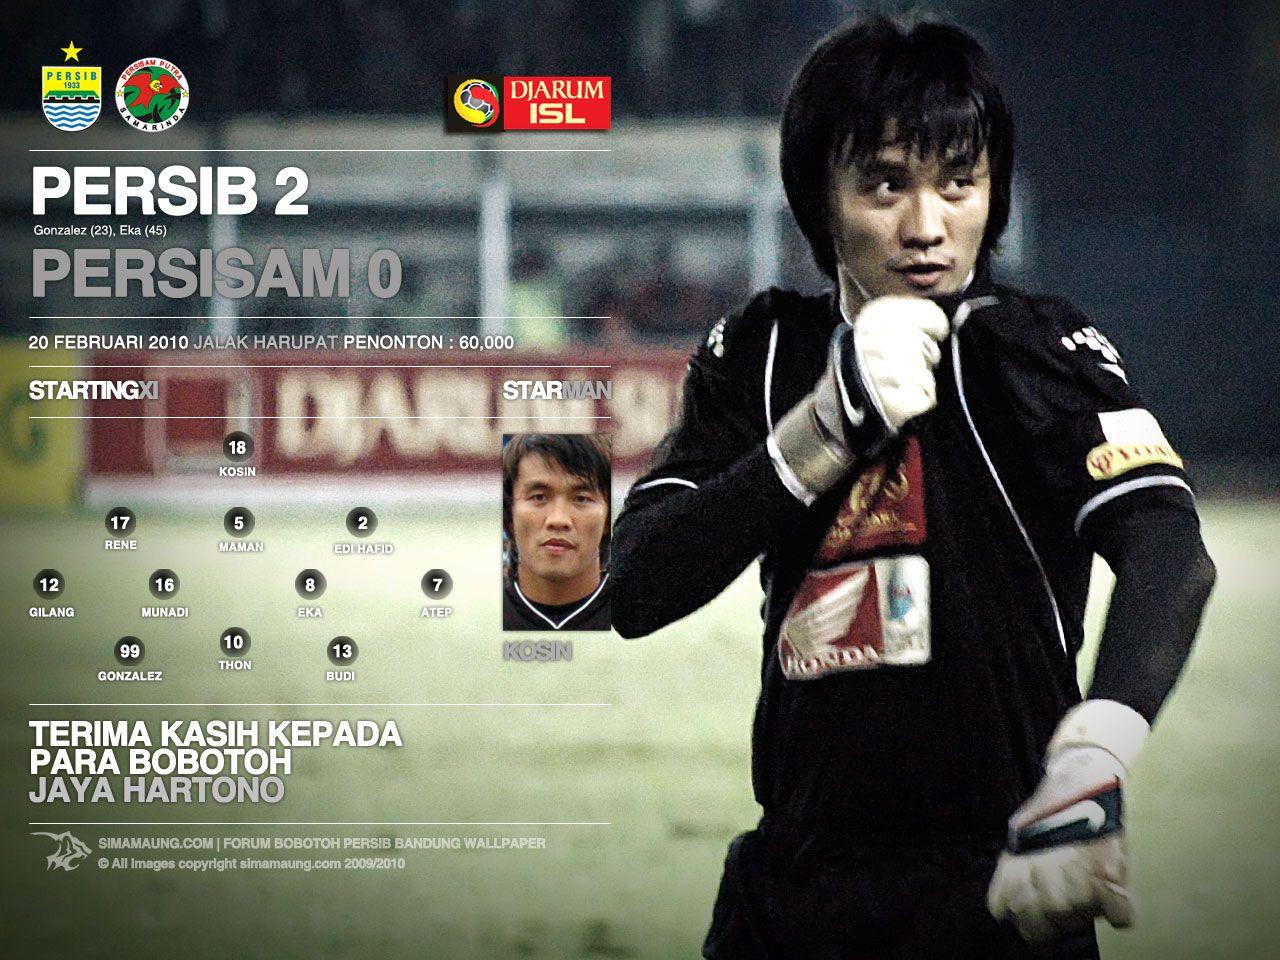 Permalink Gambar Yang Terpasang PERSIB BANDUNG Pinterest Bandung